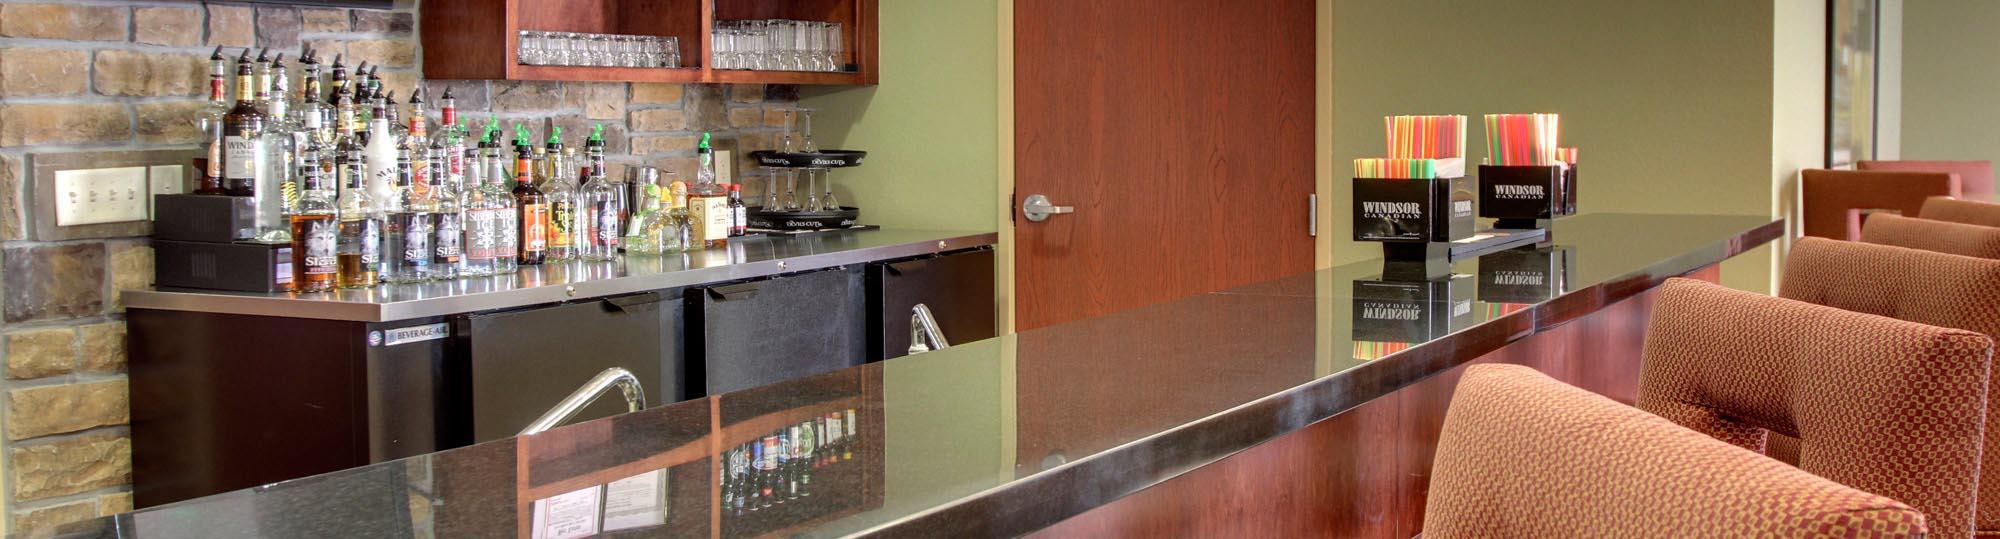 Cobblestone Inn & Suites Harper